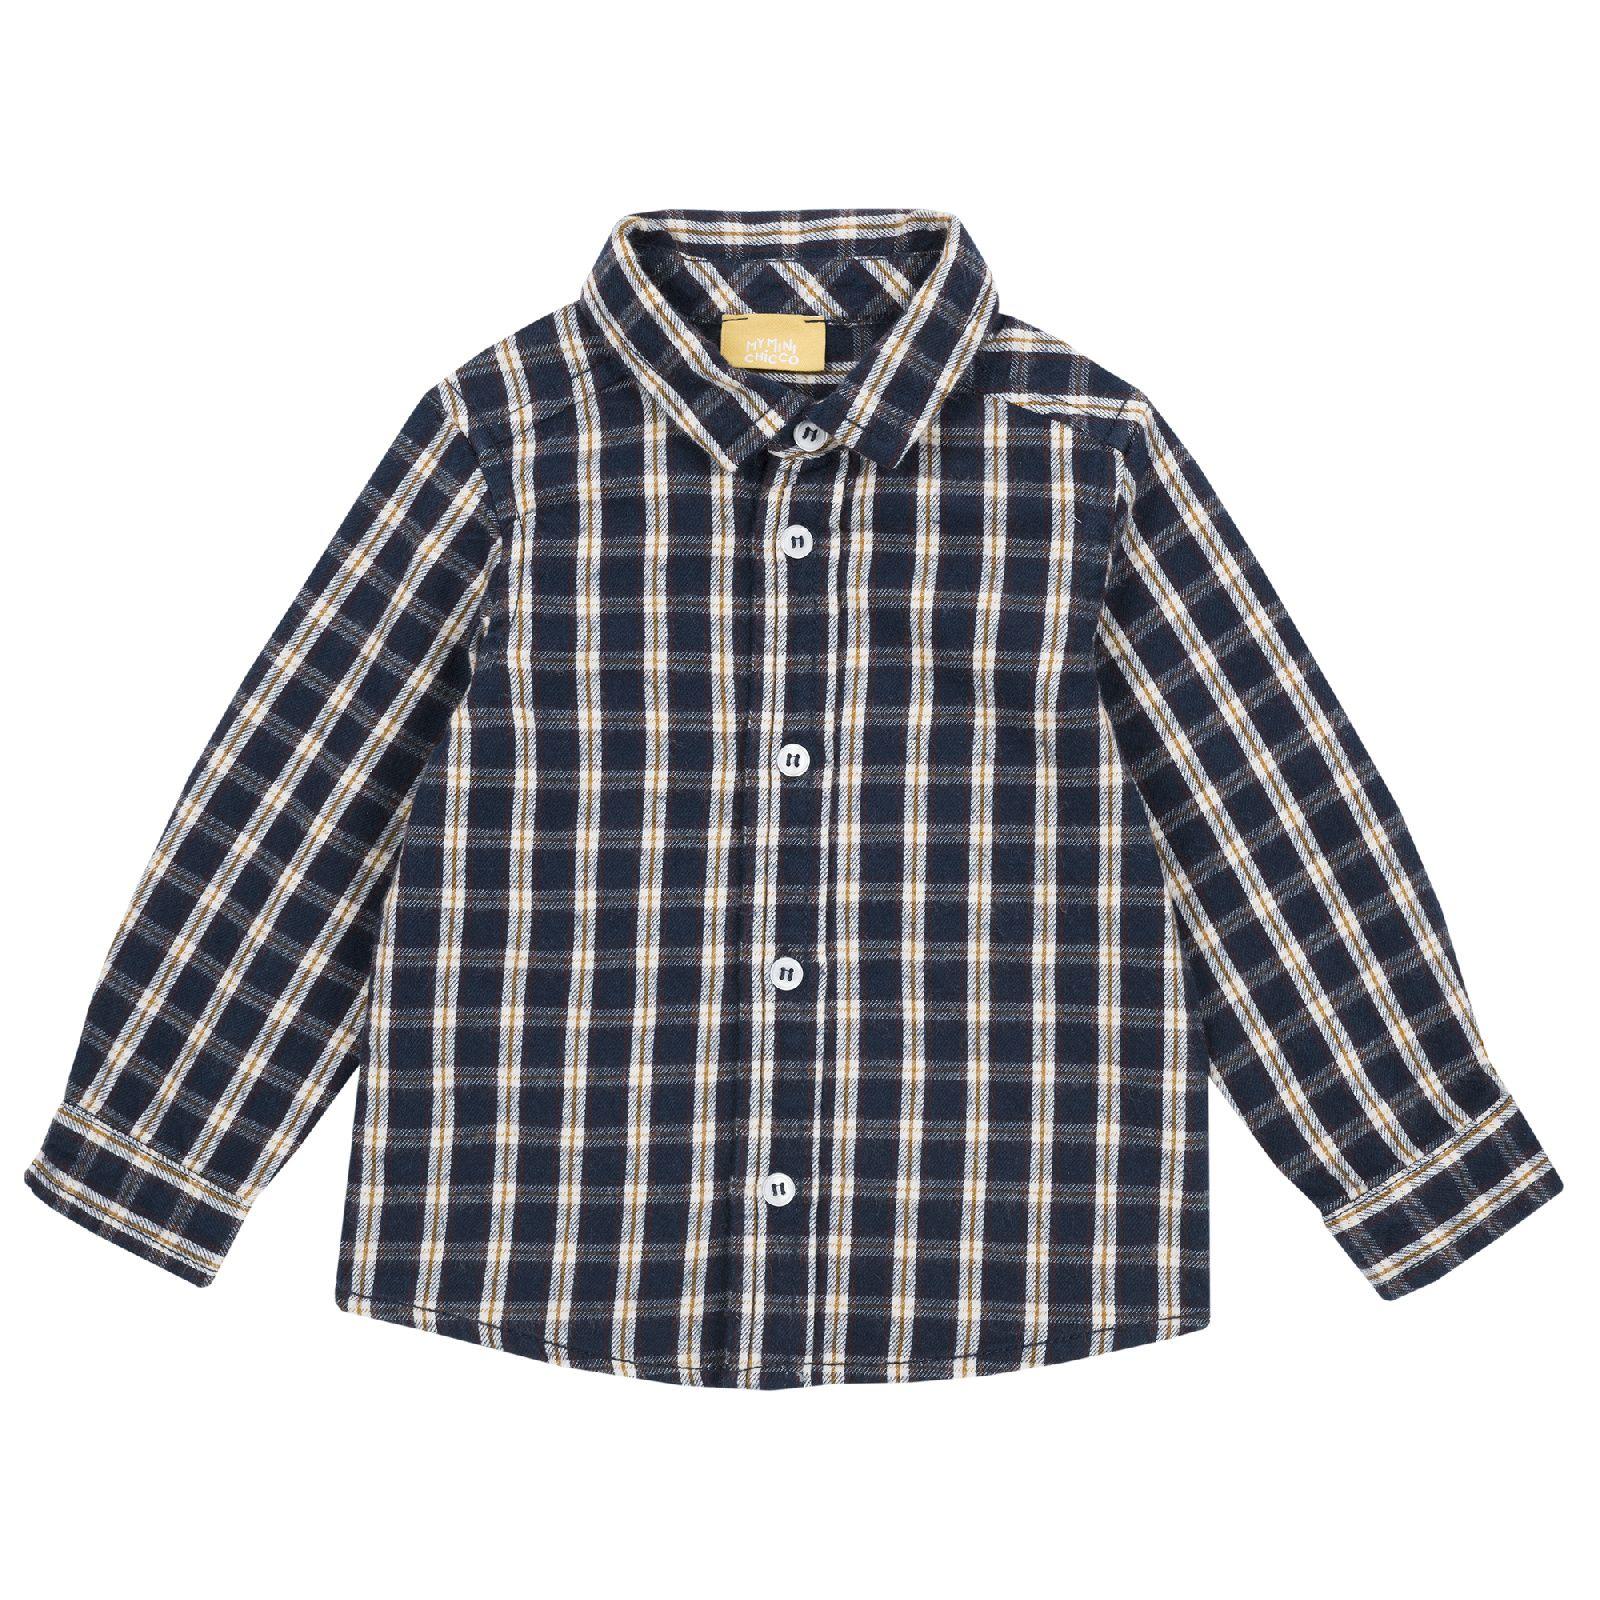 Рубашка Chicco в клетку синяя, размер 98